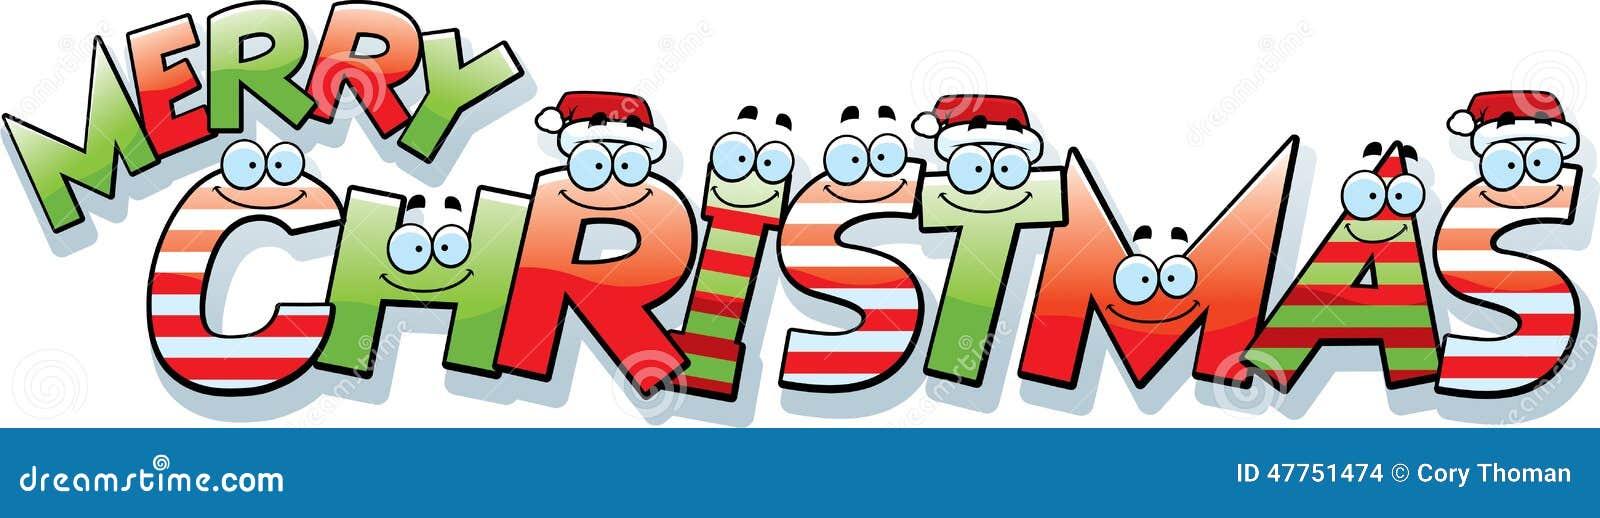 Cartoon Merry Christmas Text Stock Vector - Illustration of hats ...